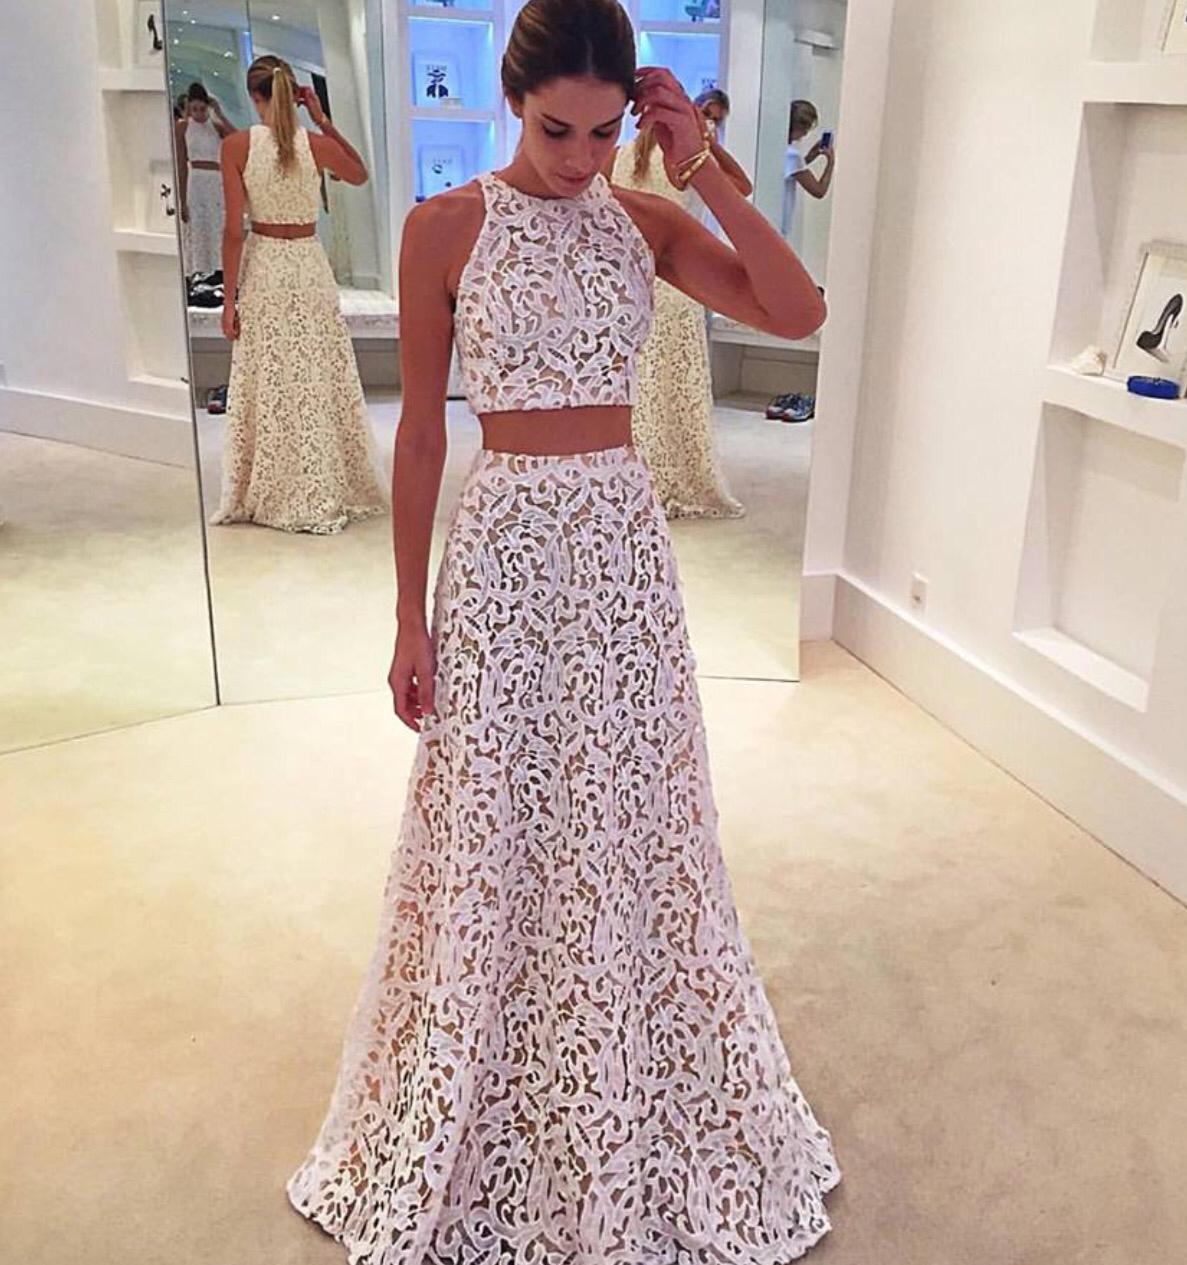 ac39739450f Elegant A-Line Two-Piece White Lace Long Prom Dress · dressthat ...